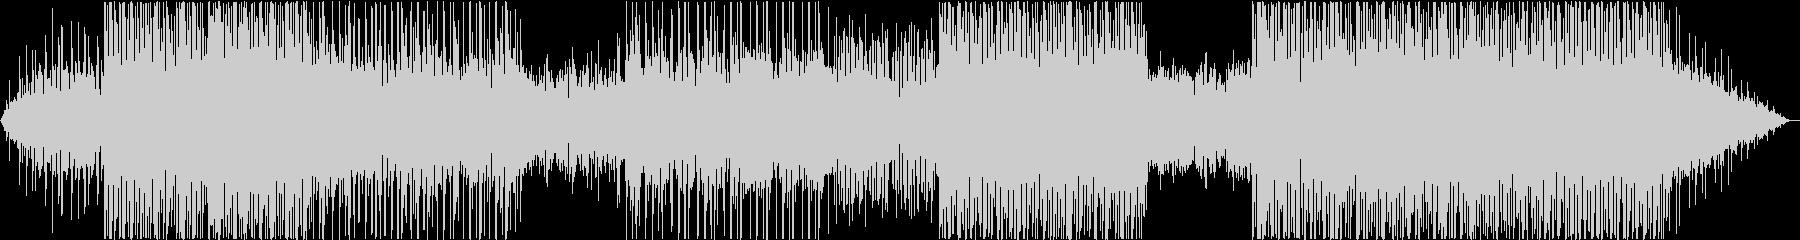 Synthpop/Beat/Retroの未再生の波形